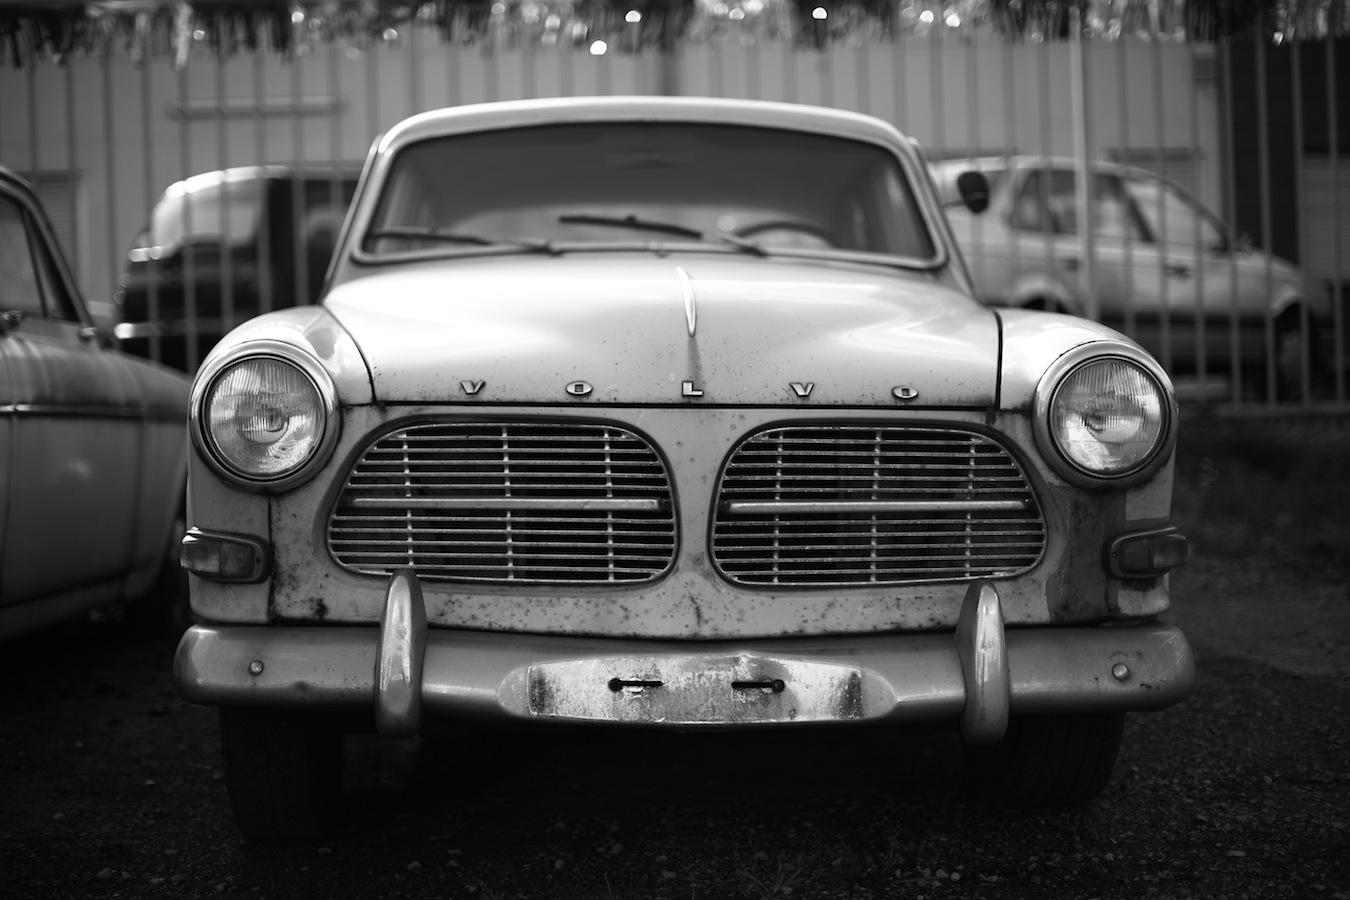 Volvo <3